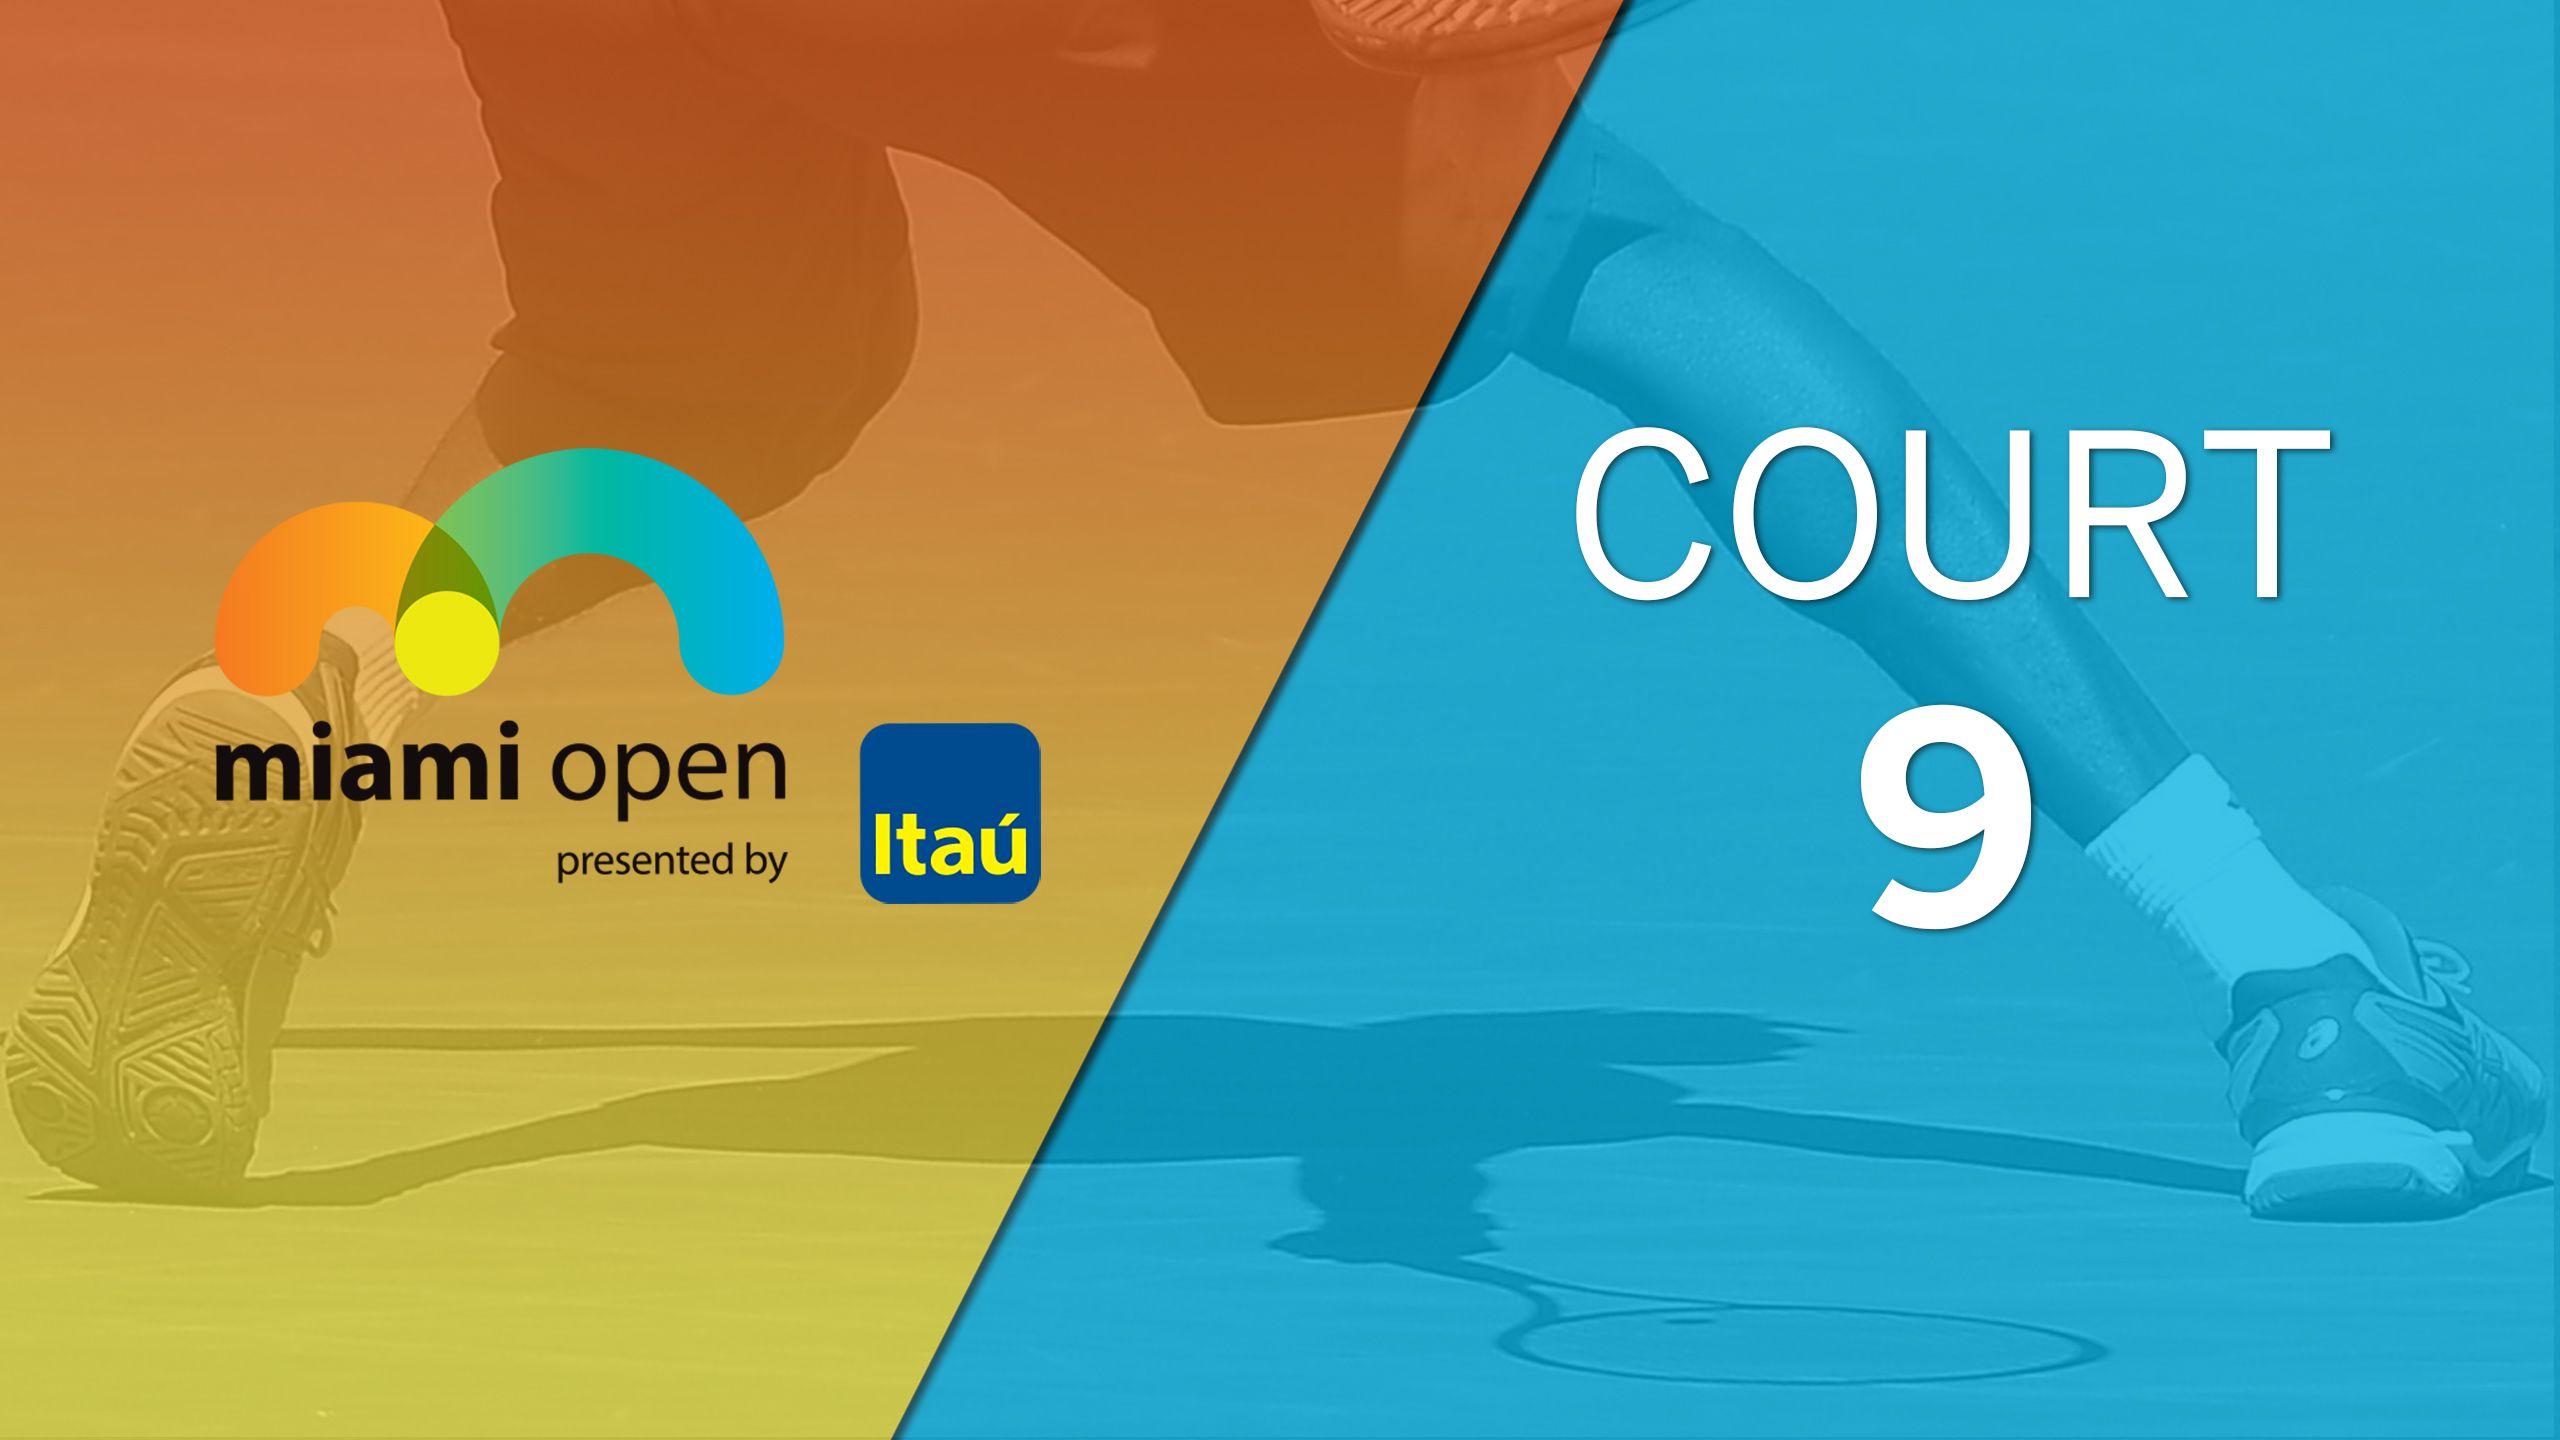 Miami Open - Court 9 (Doubles)